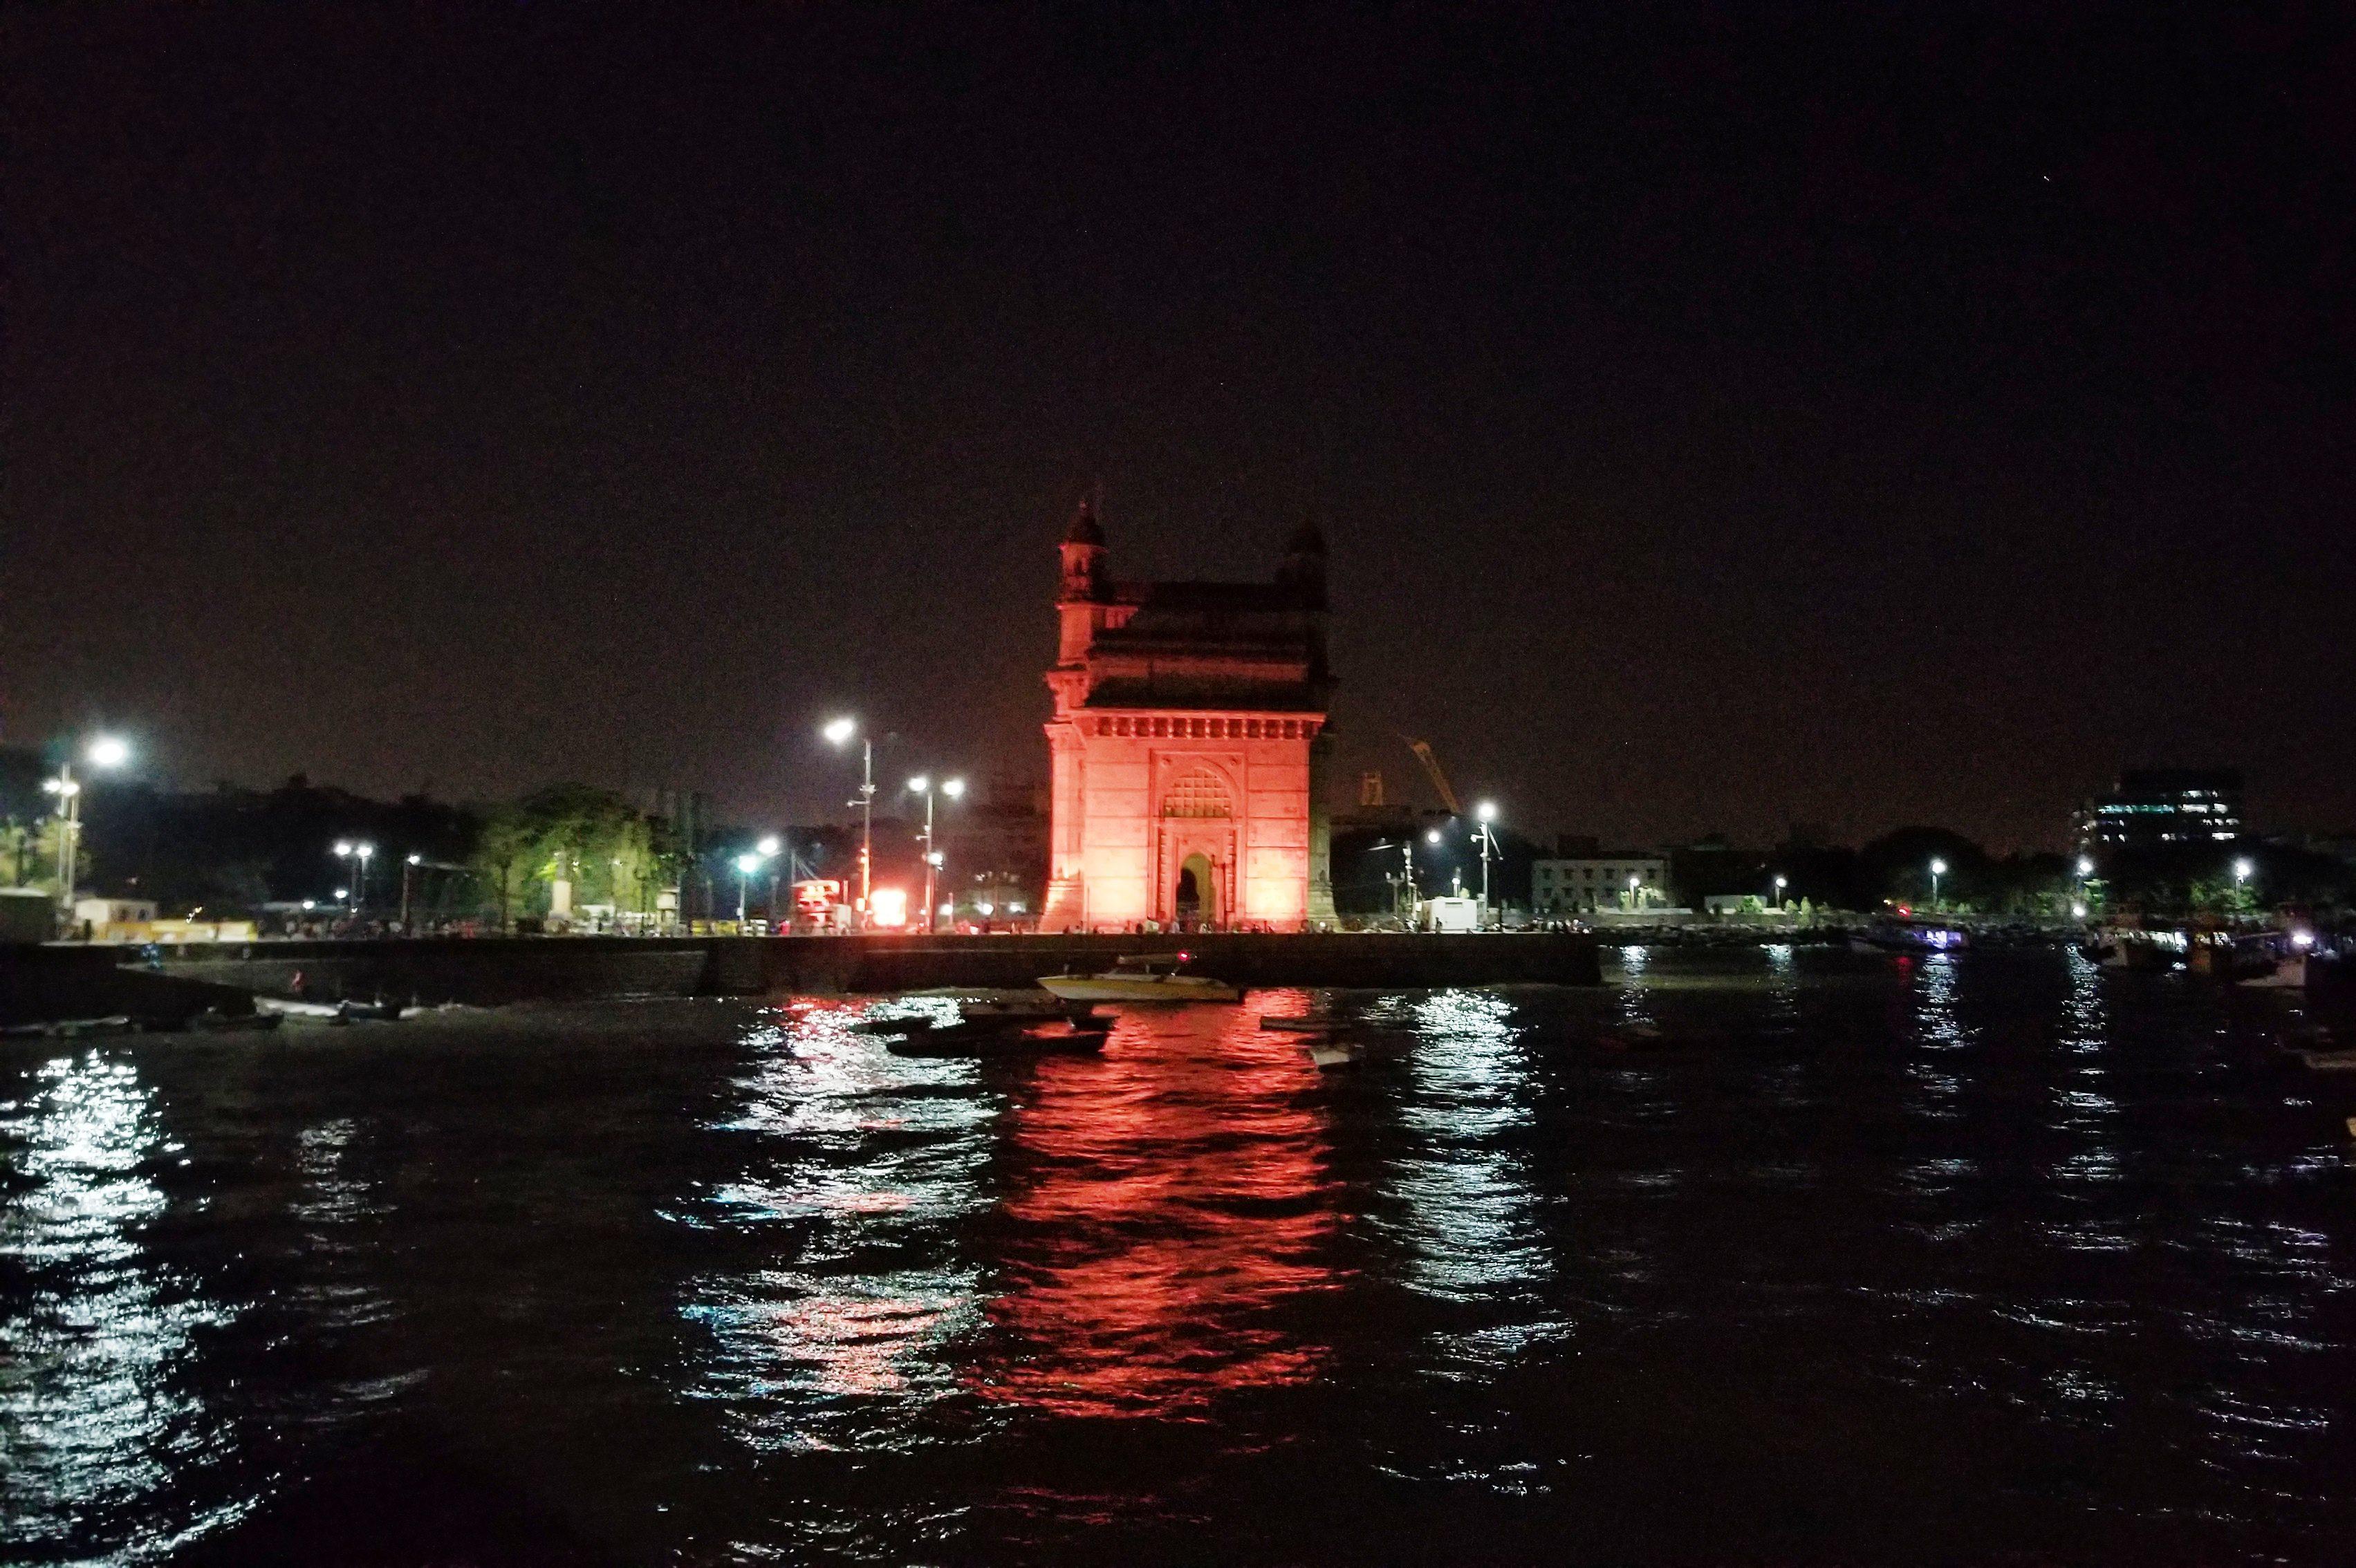 On Location - Mumbai, India